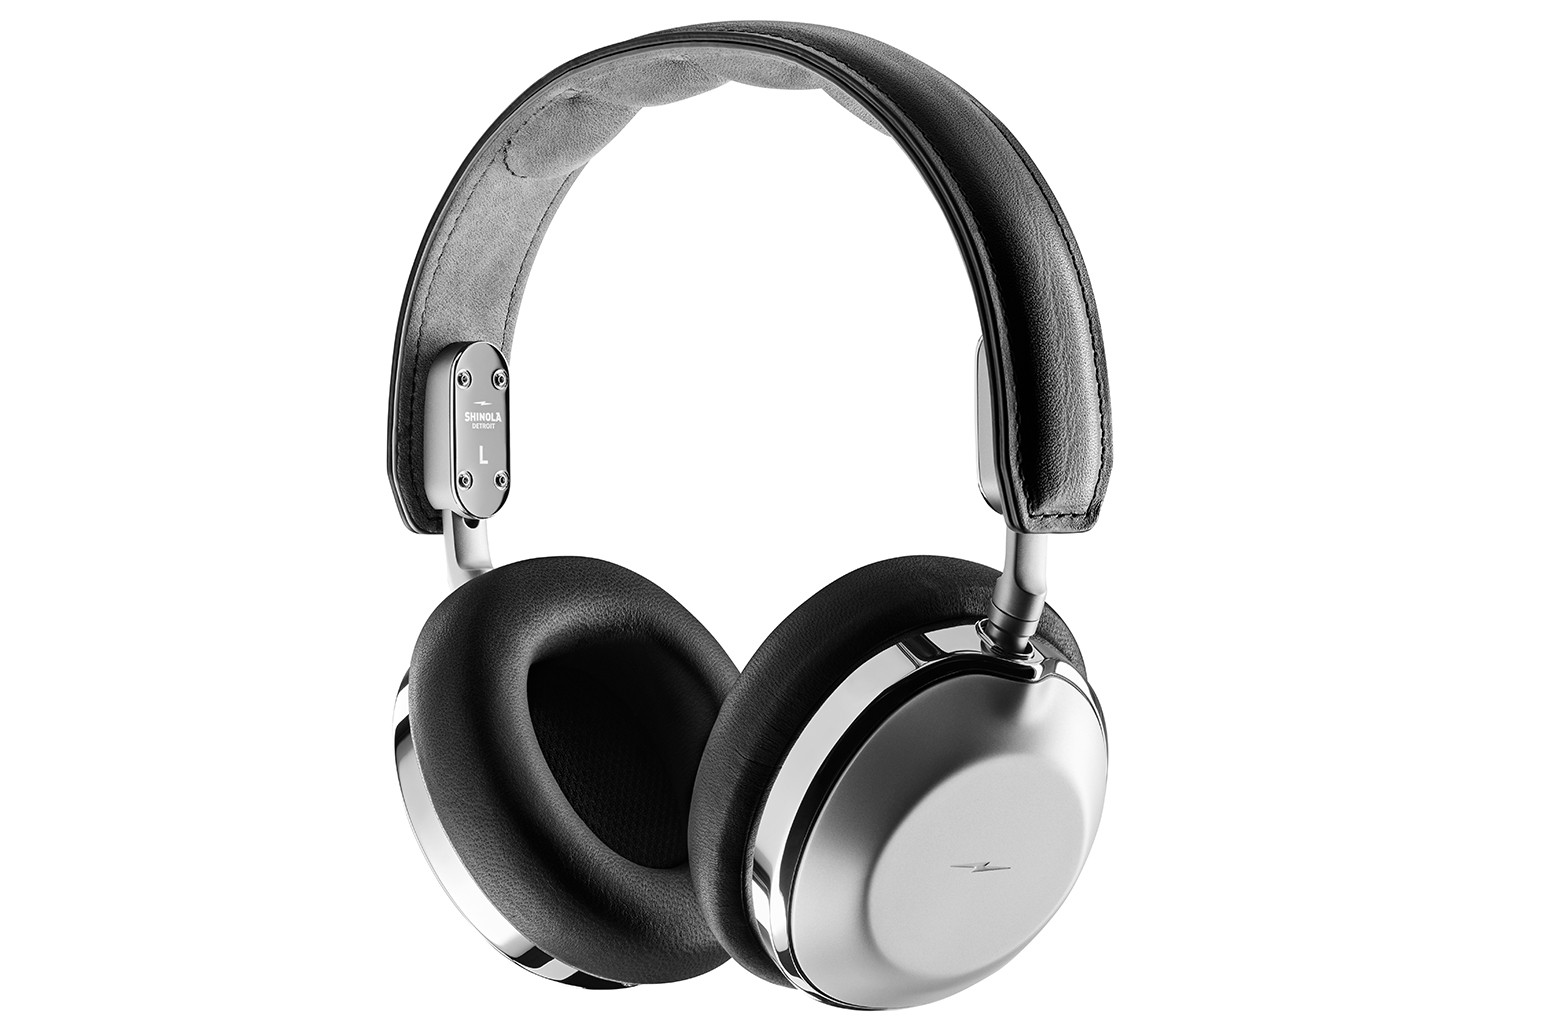 Canfield Over-Ear Headphones